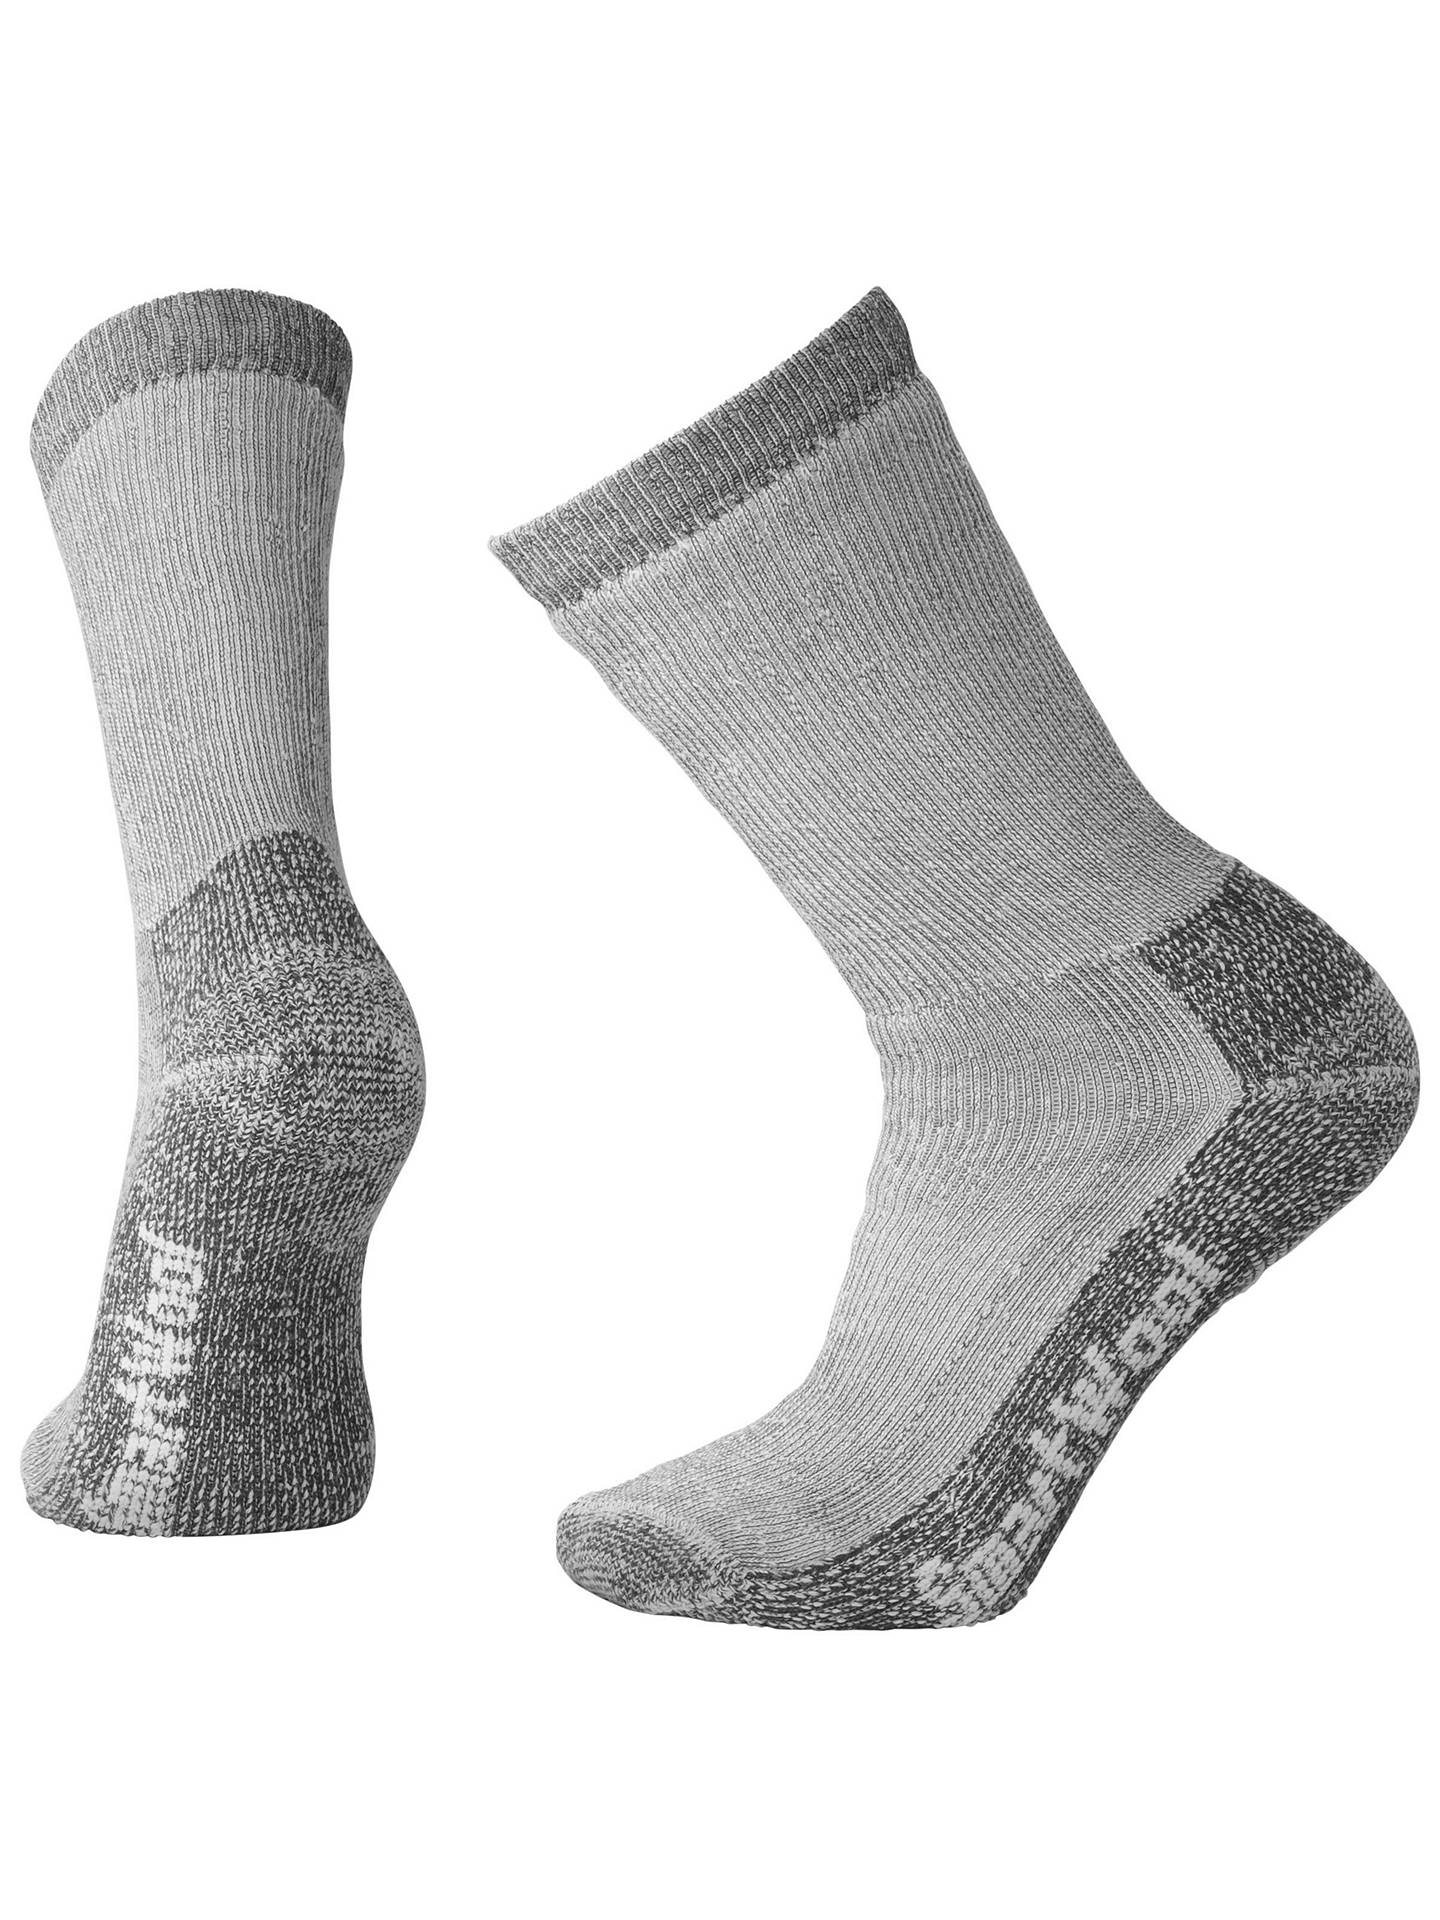 a2f87659f SmartWool Merino Wool Trekking Heavy Crew Unisex Socks, Grey